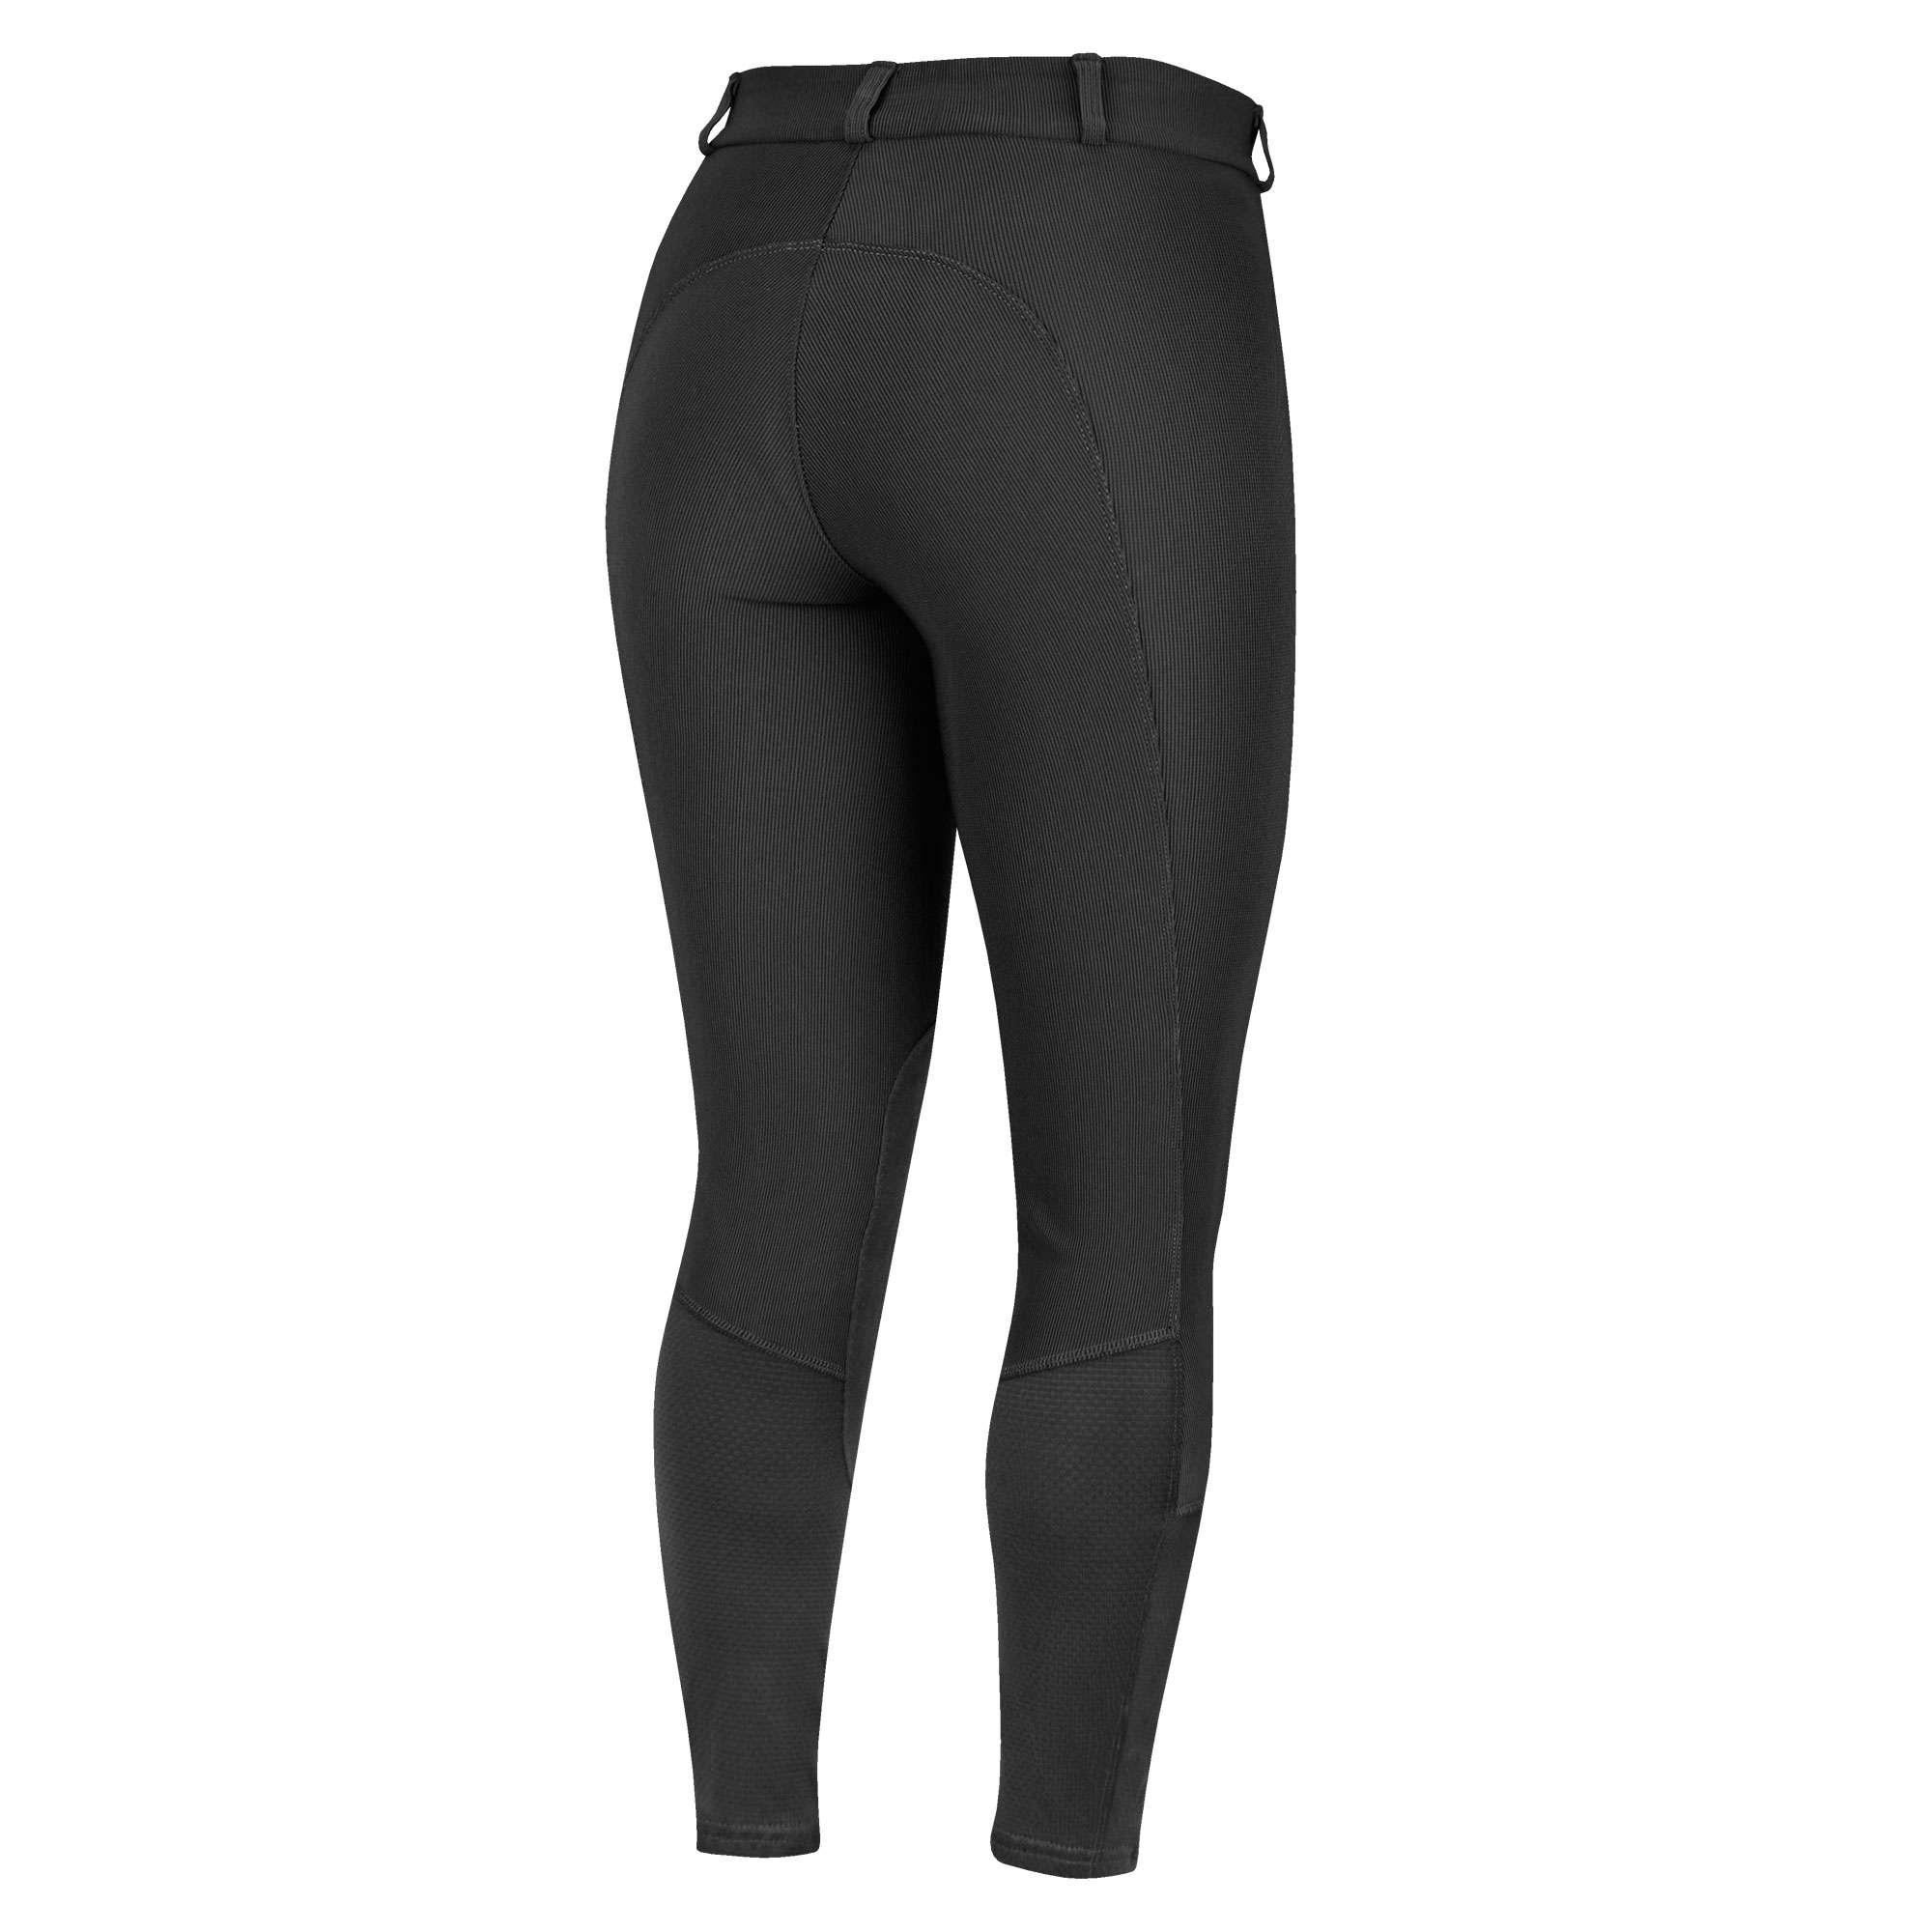 Irideon Ladies Cadence Euro Knee Patch Riding Breeches Compressive Stretch-Cord